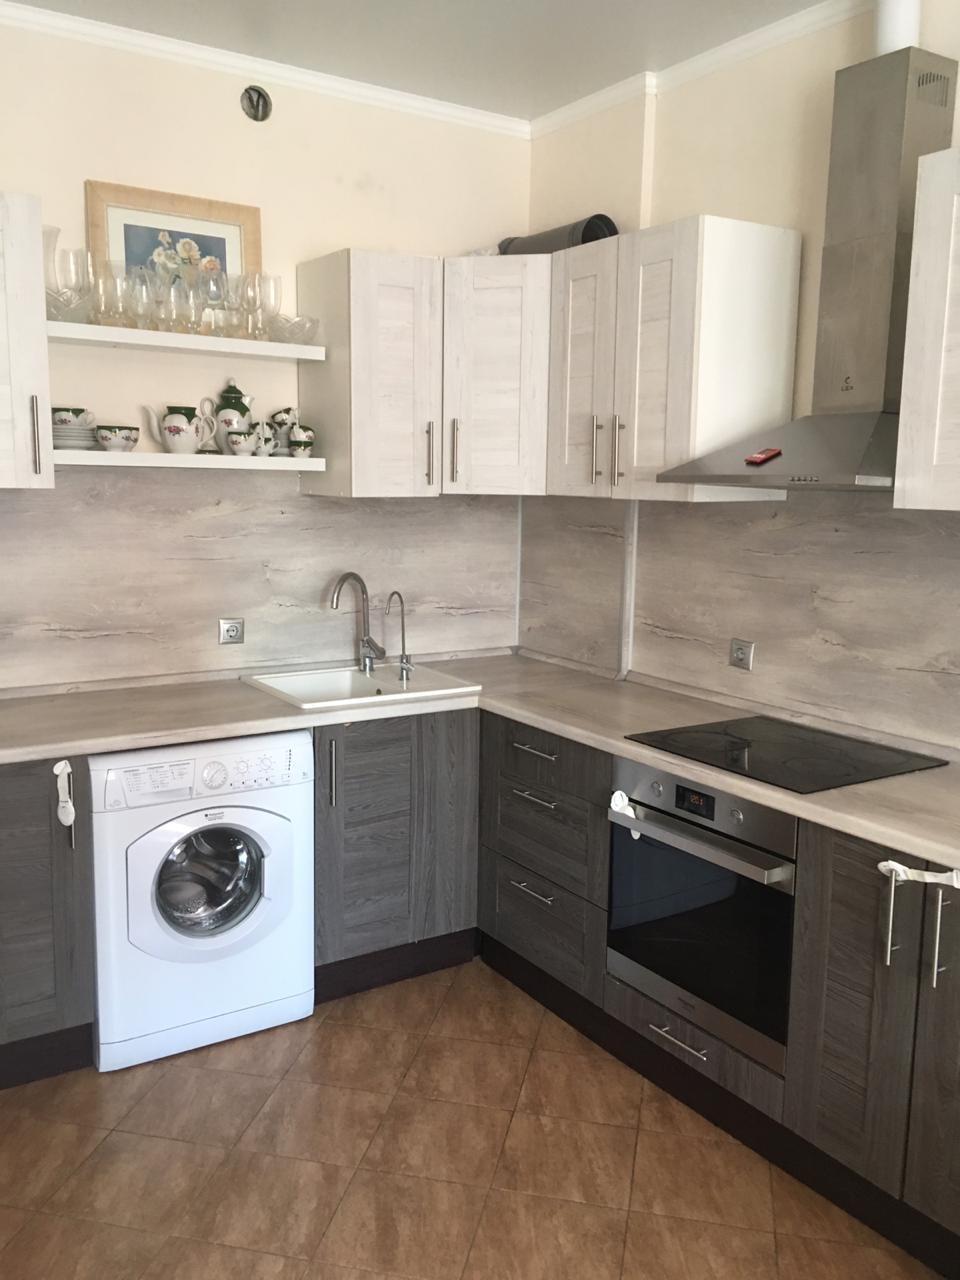 Квартира, 1 комната, 47 м² в Коммунарке 89055769697 купить 5